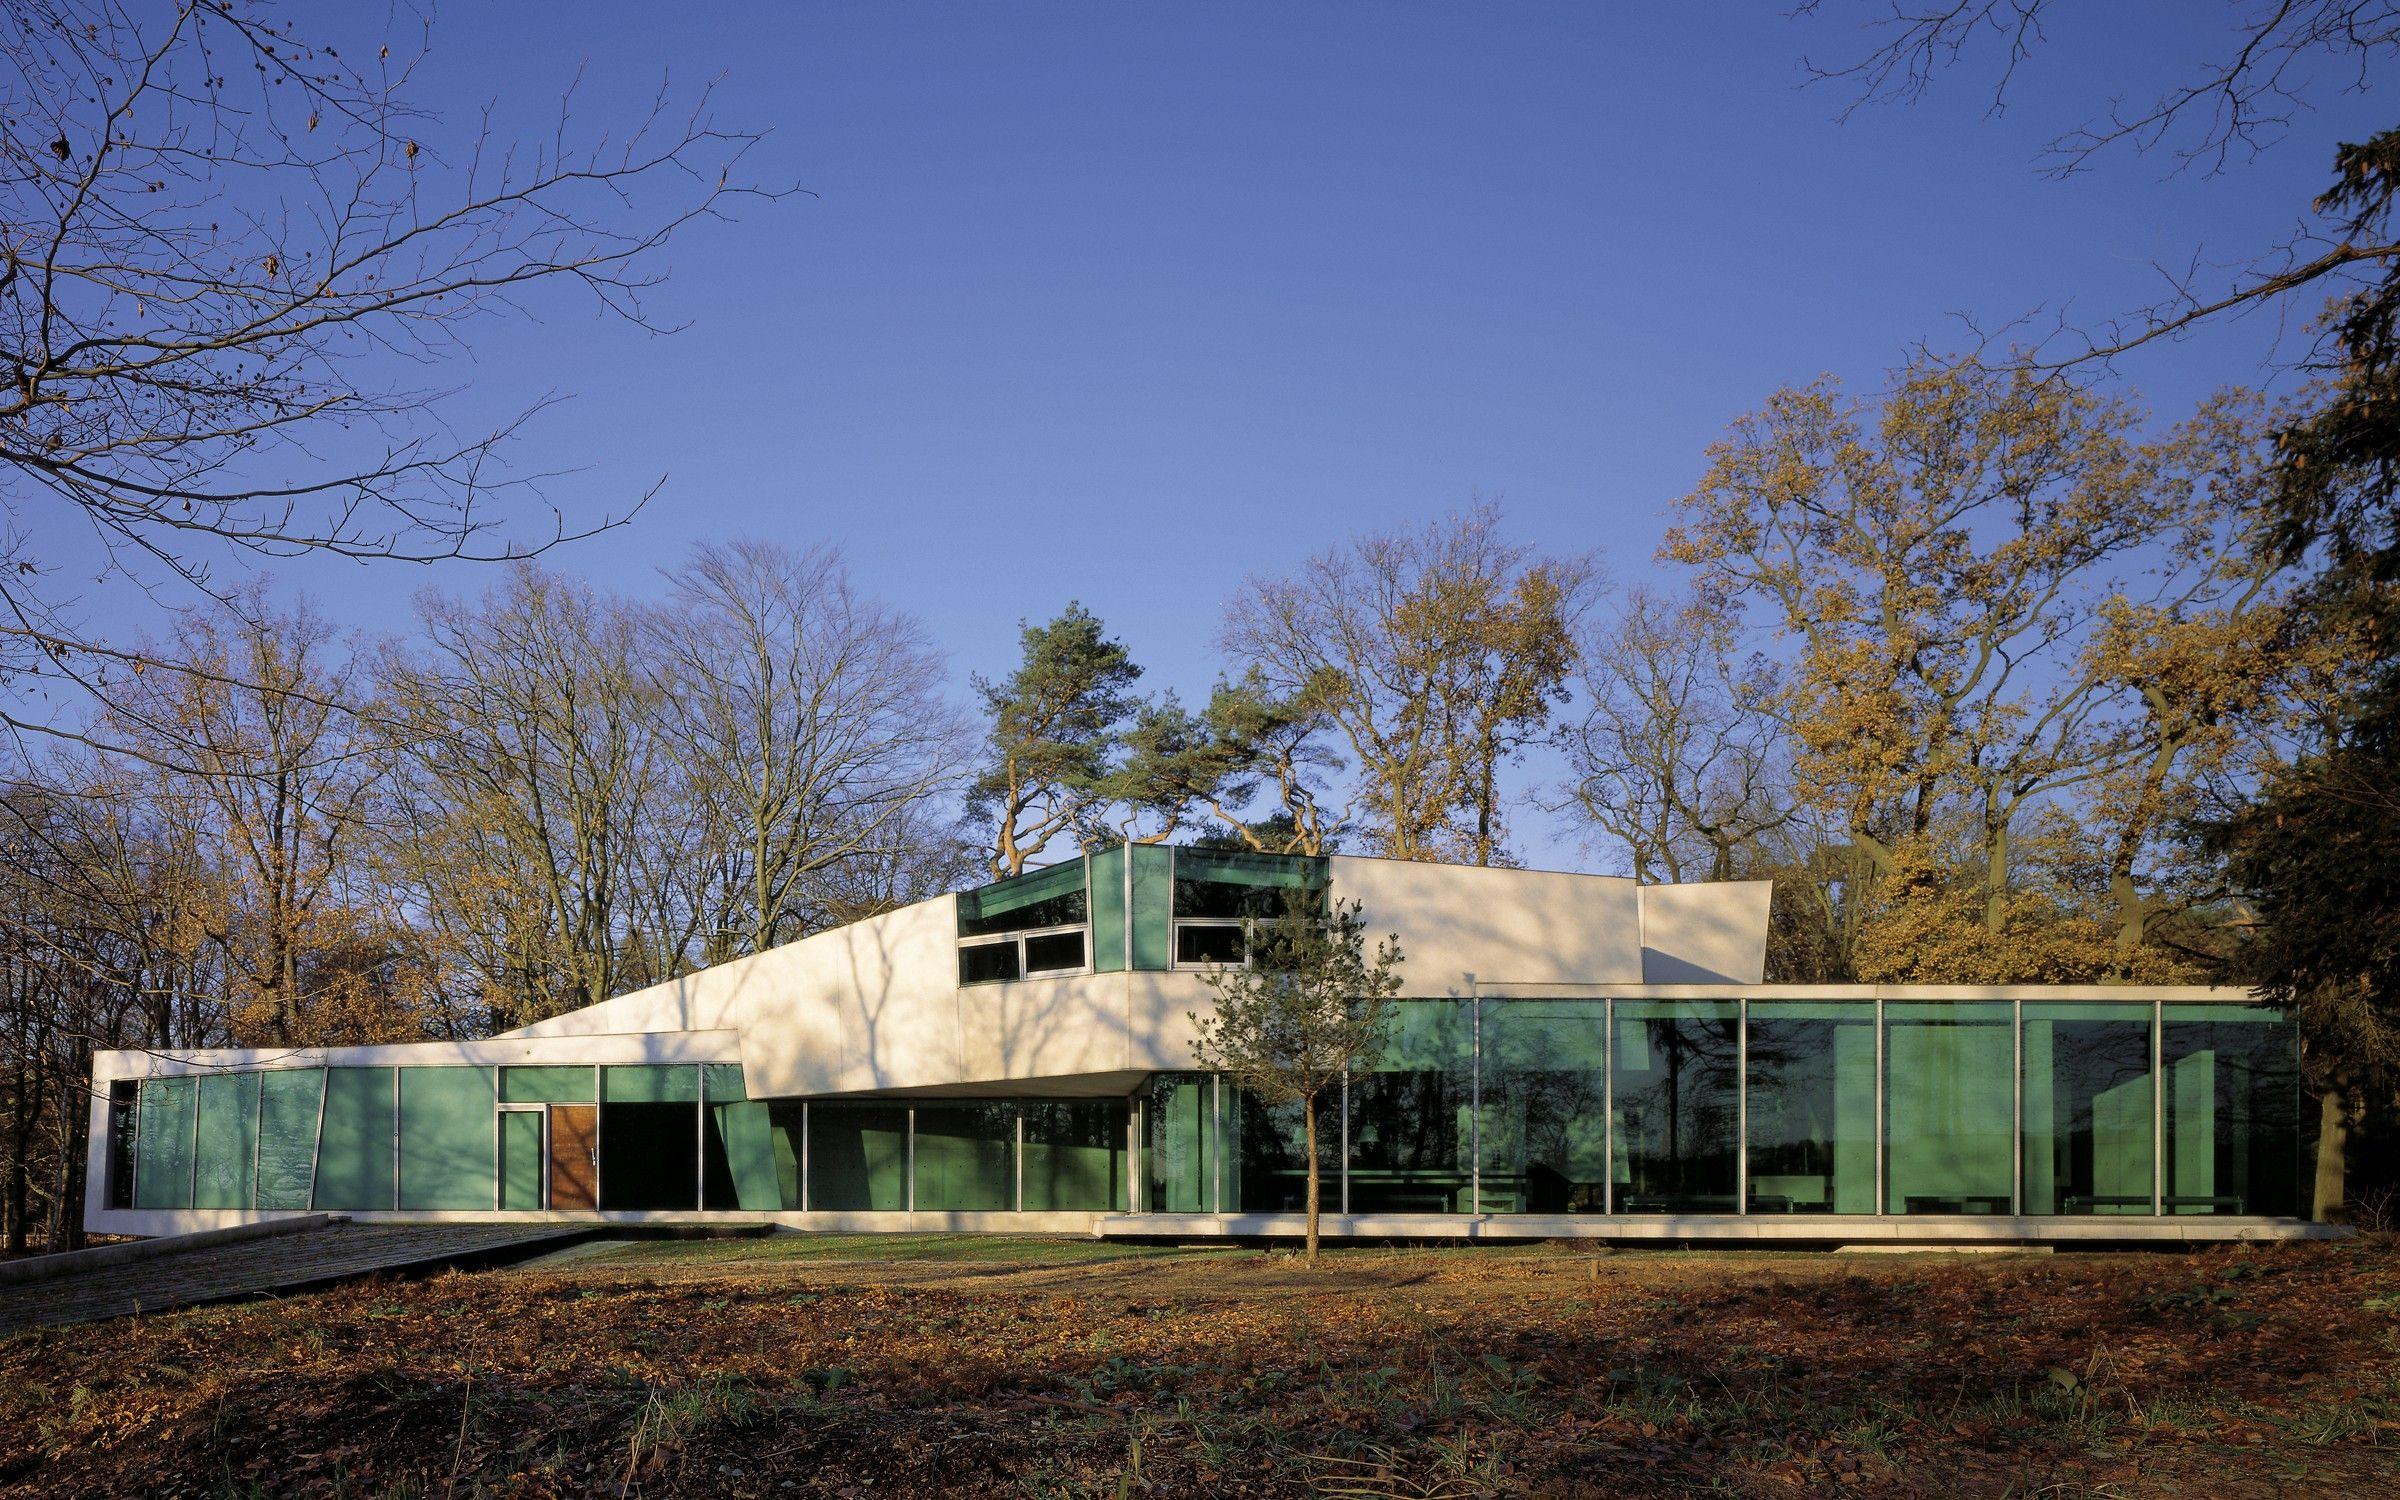 Un studio van berkel bos möbius house a part of the collection the un private house